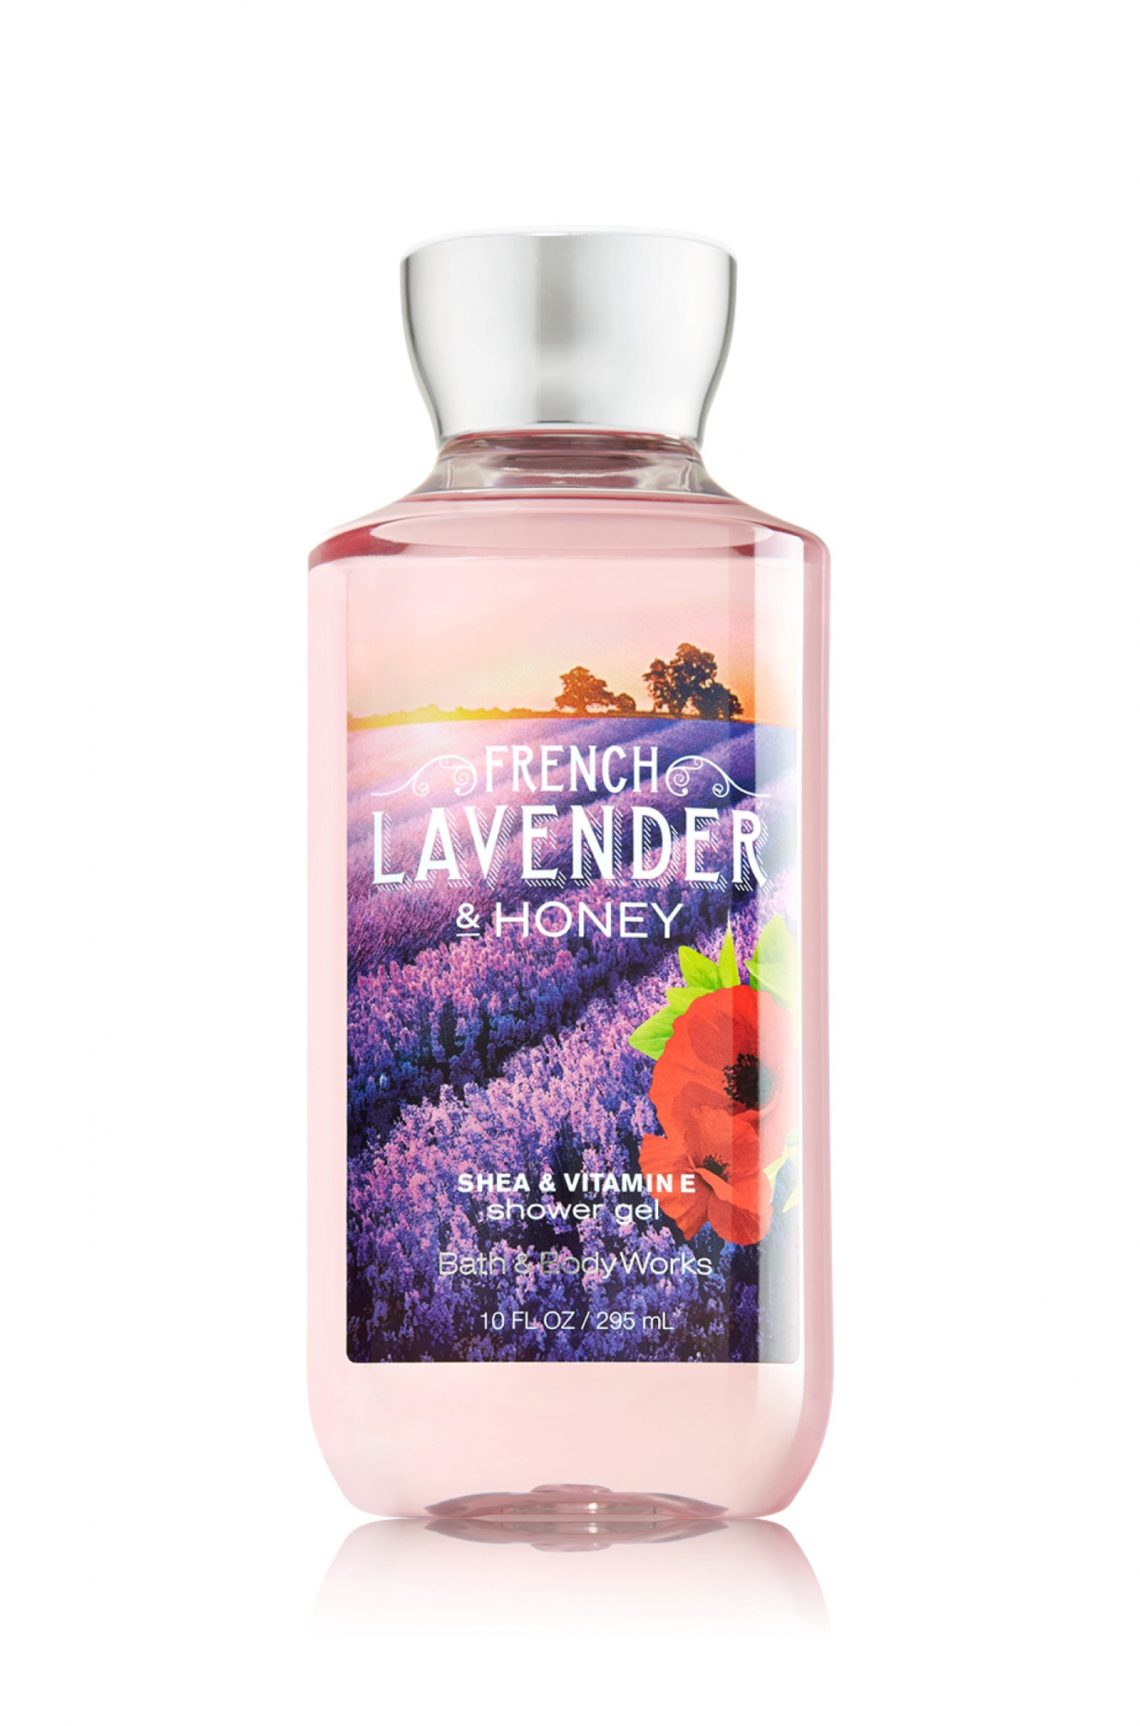 Bath & Body Works - French Lavender & Honey Shower Gel